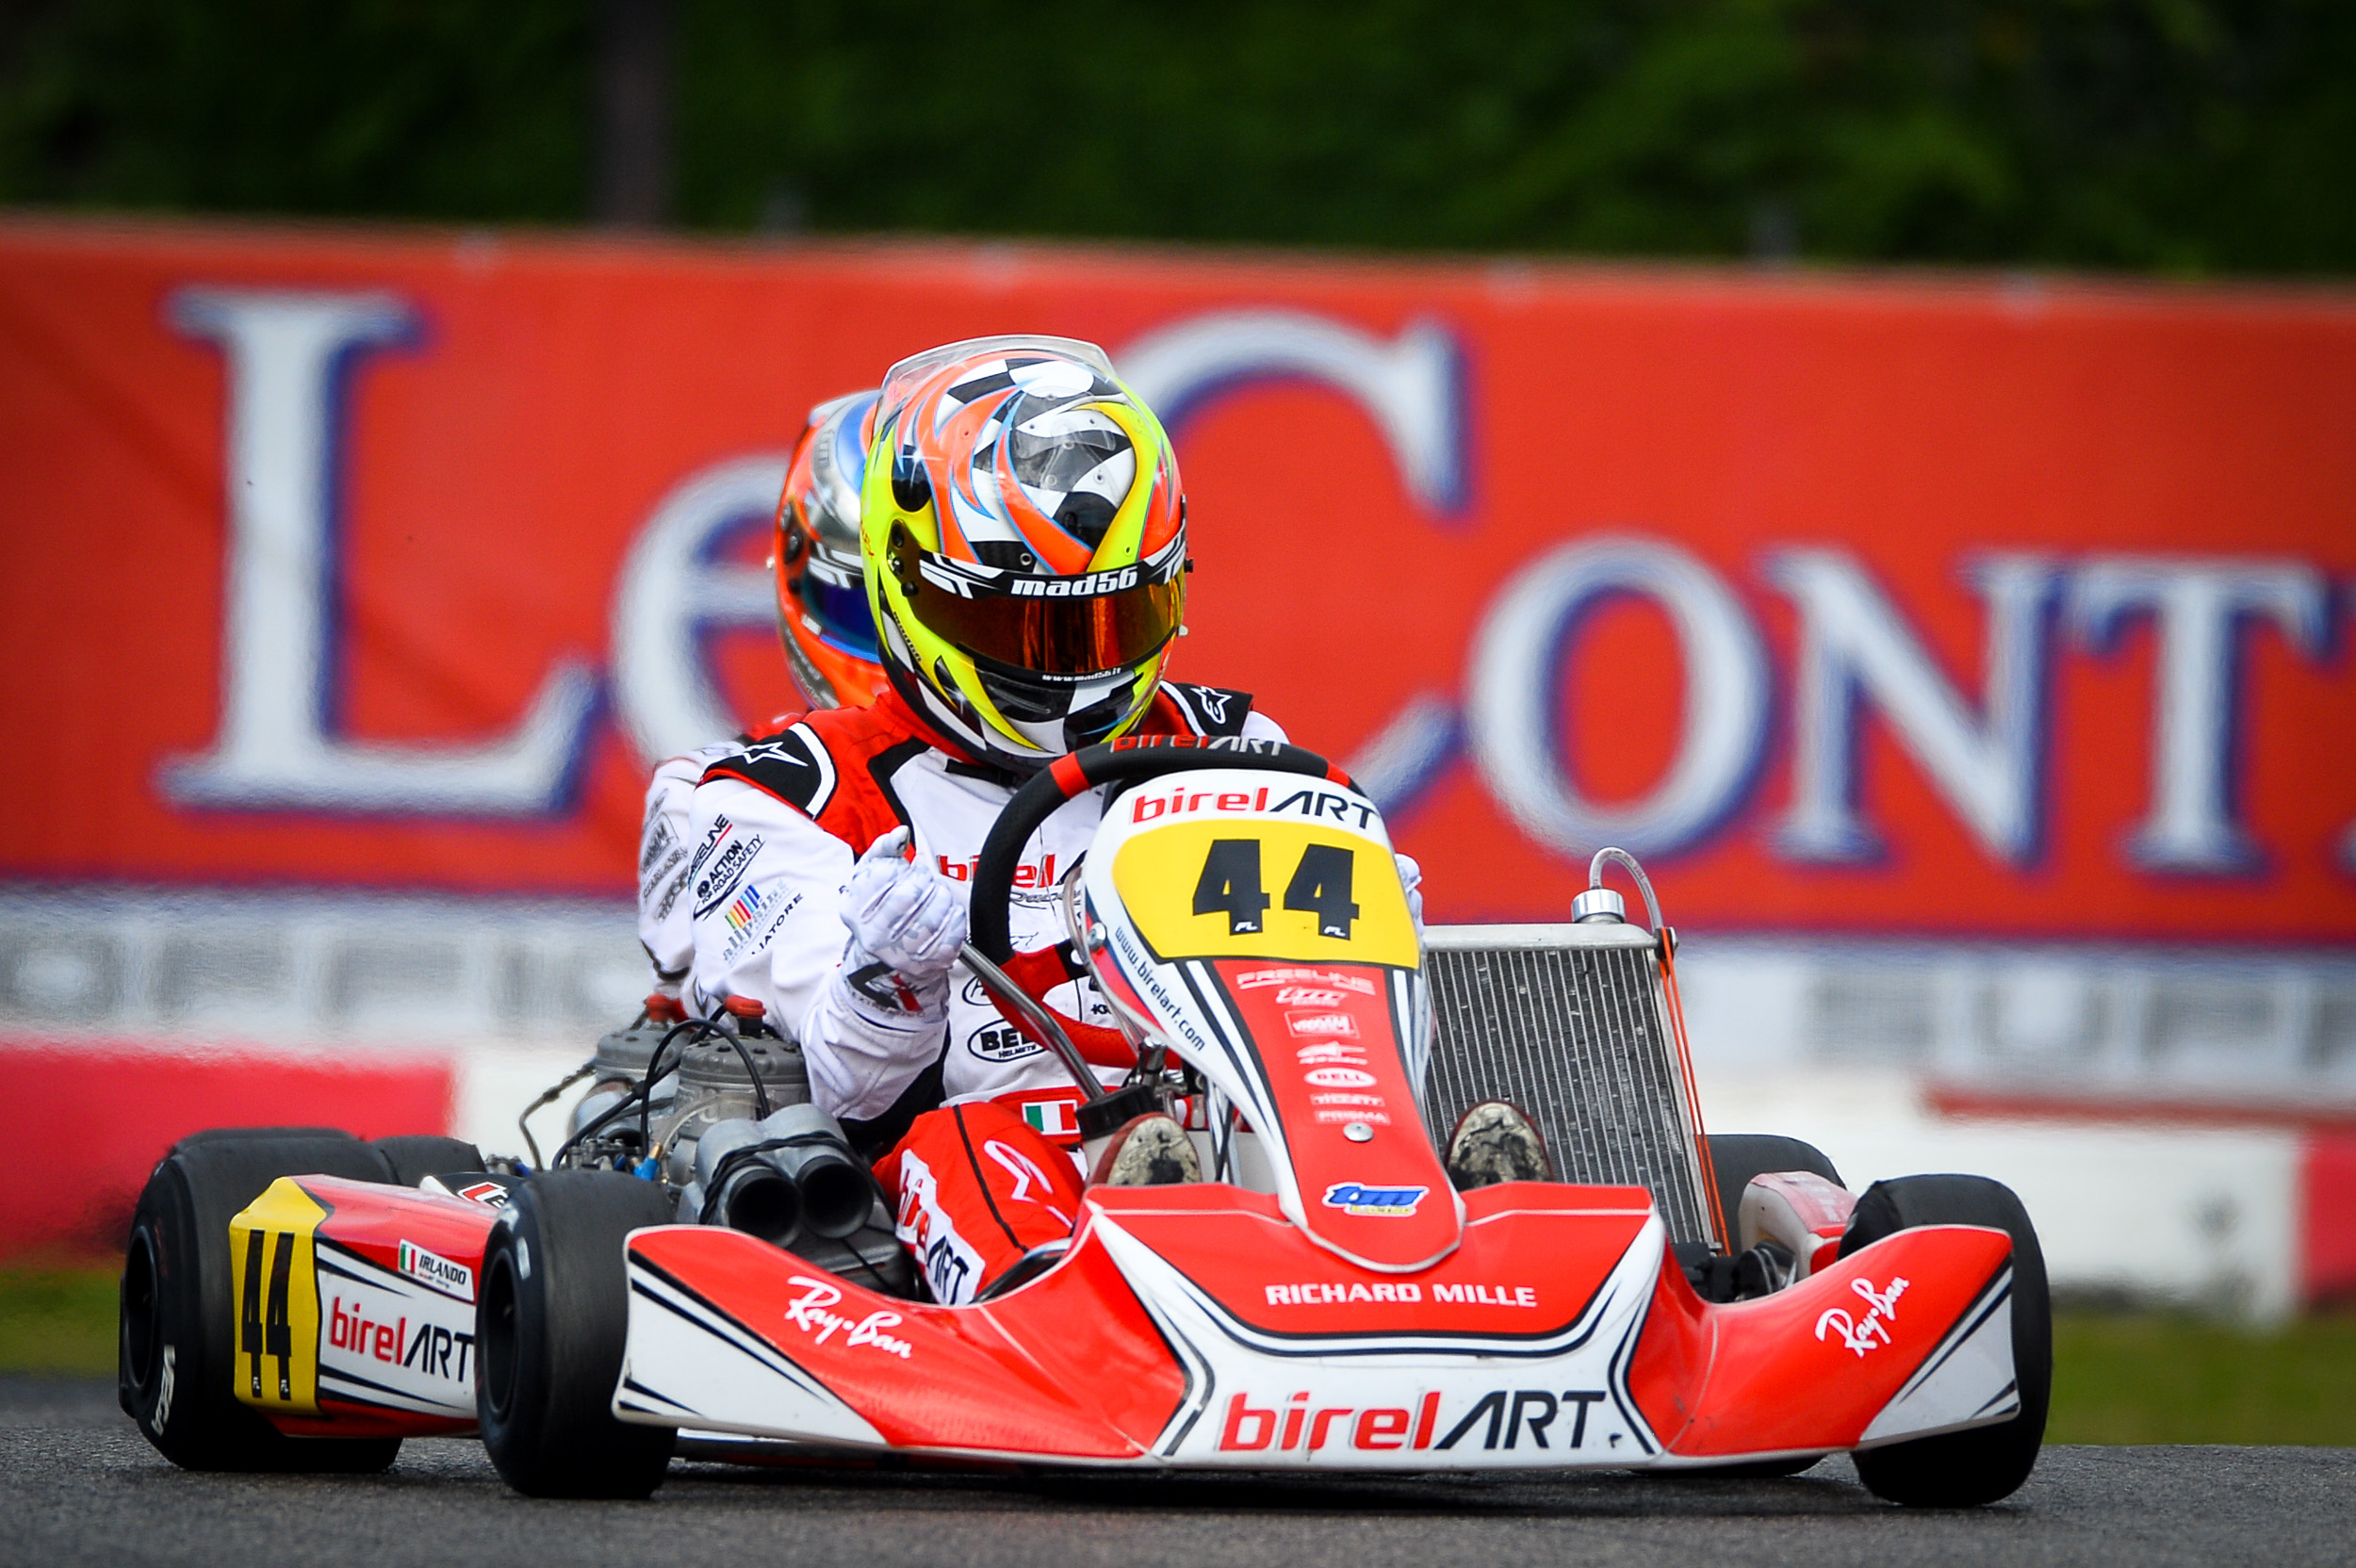 Top ten for Alex Irlando at KZ World Cup